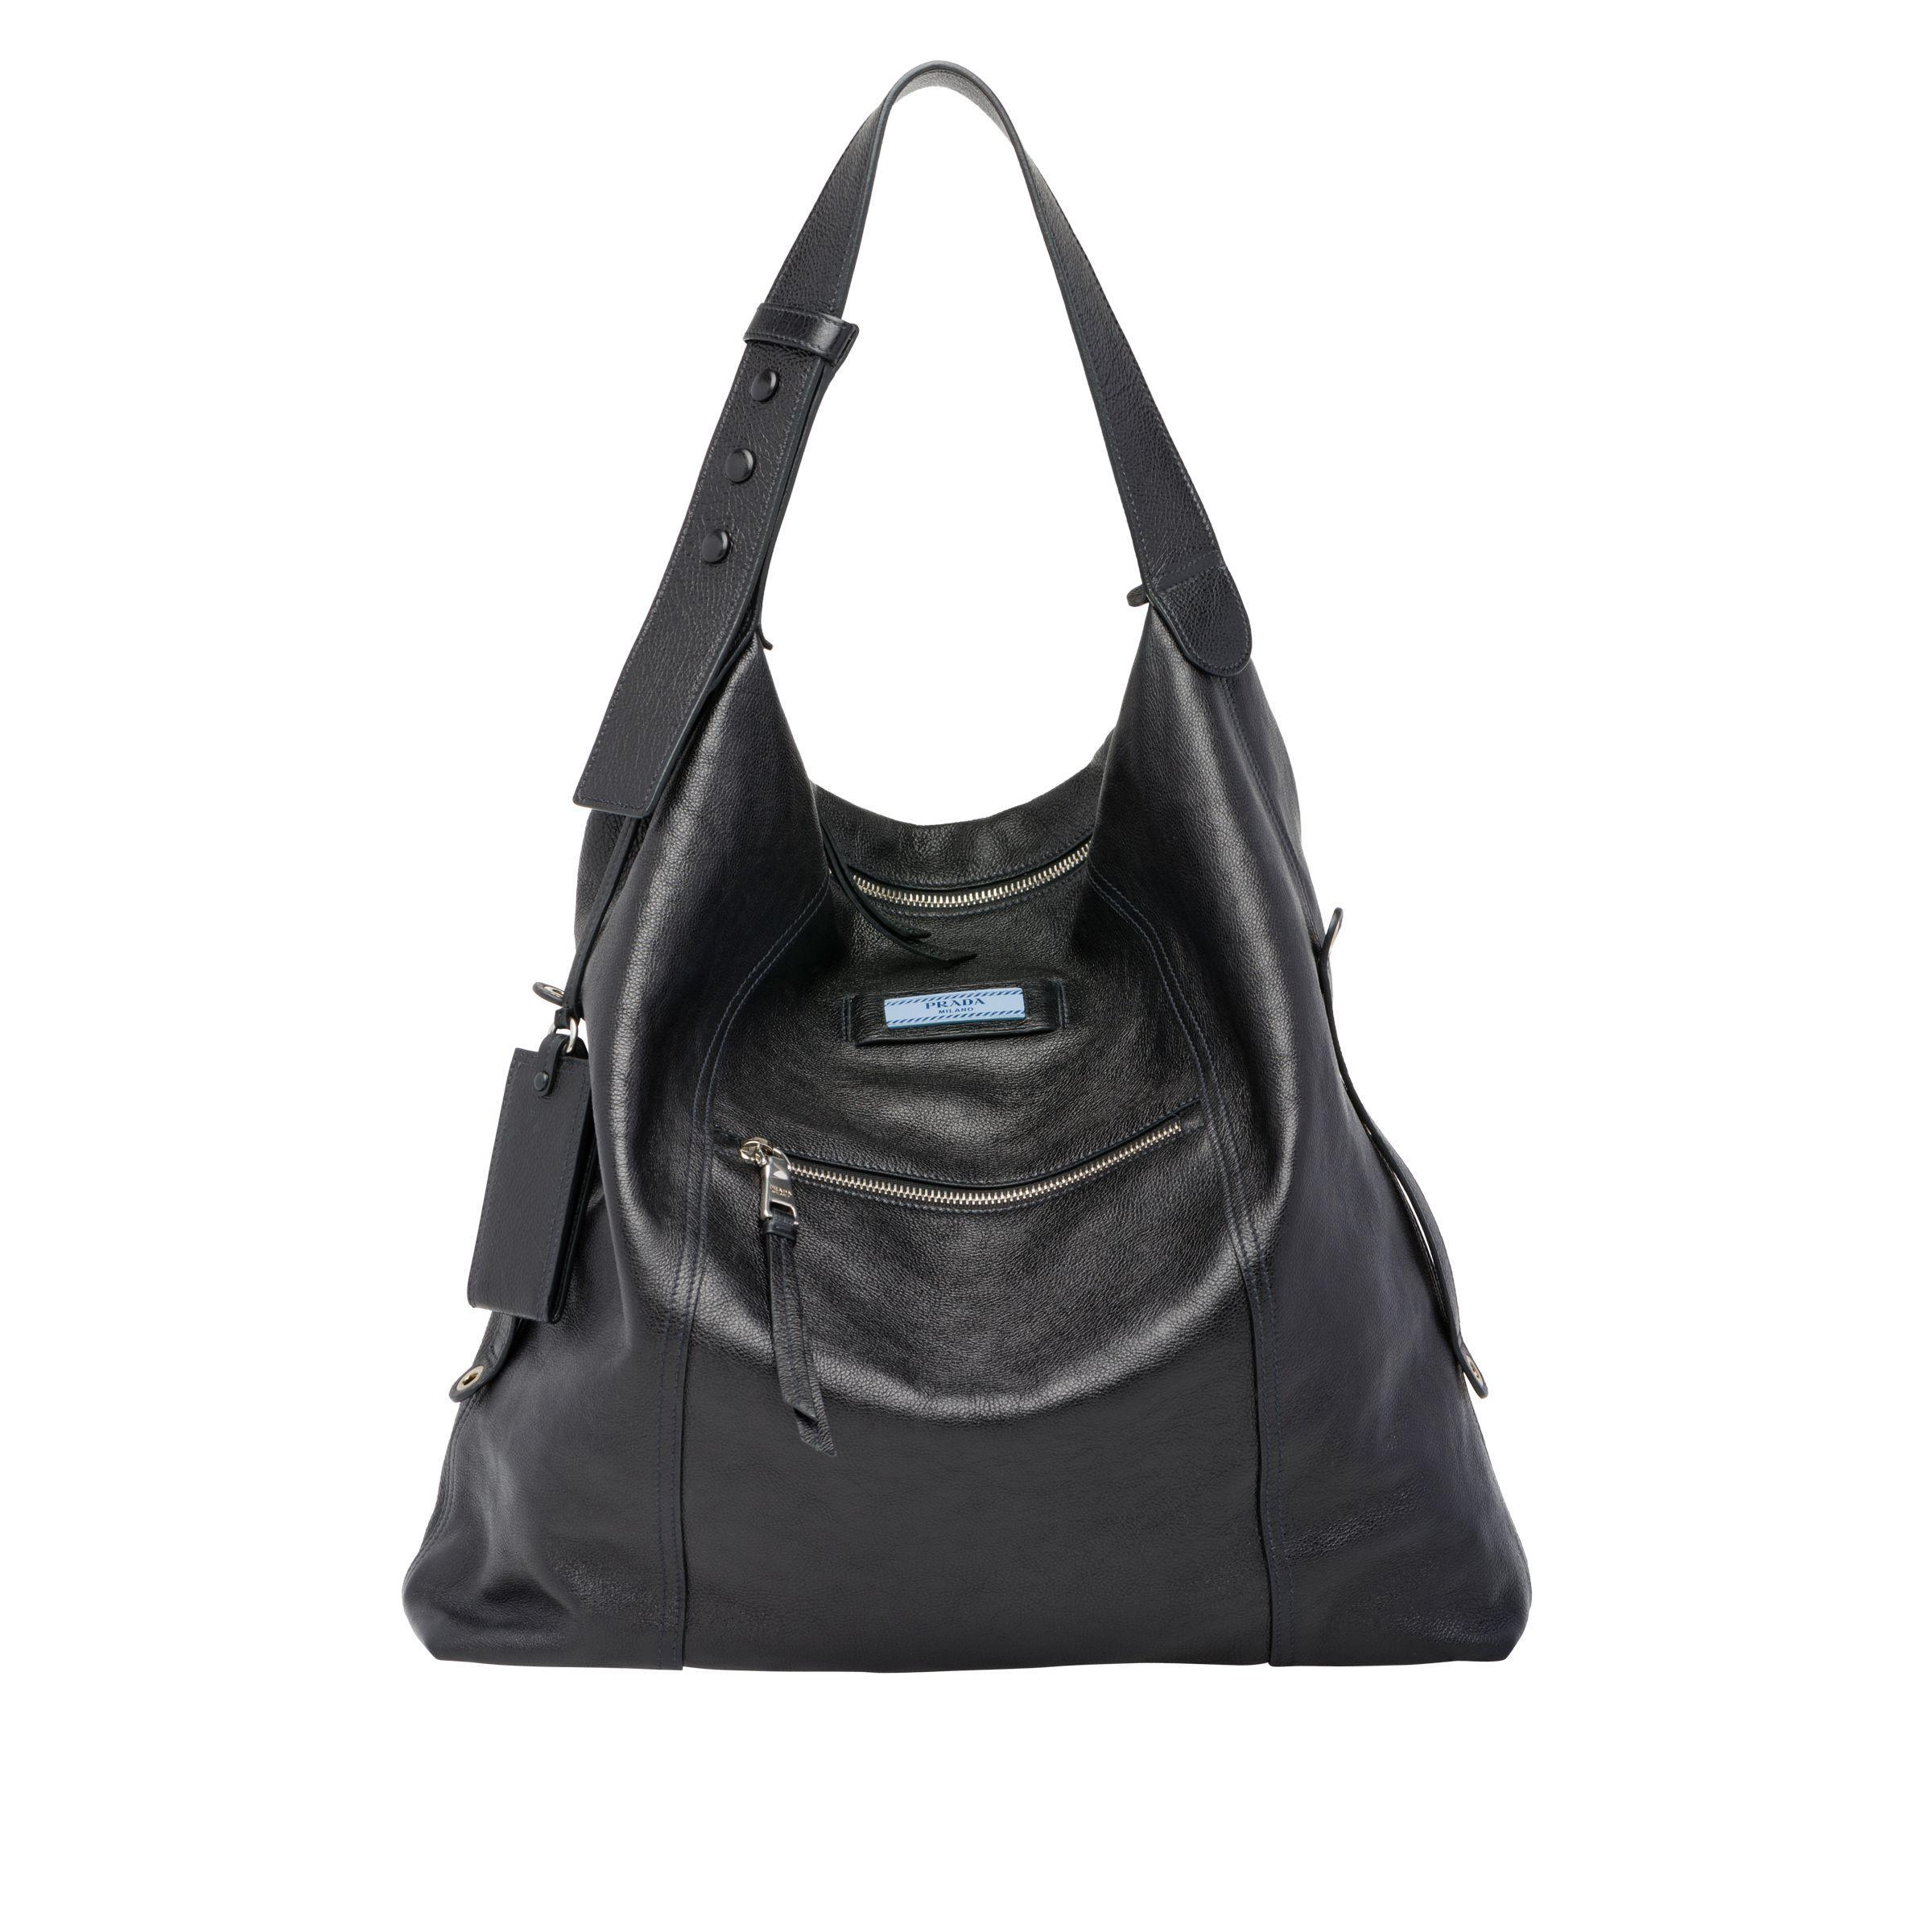 7ca255faf35b Prada - Black Etiquette Leather Bag - Lyst. View fullscreen